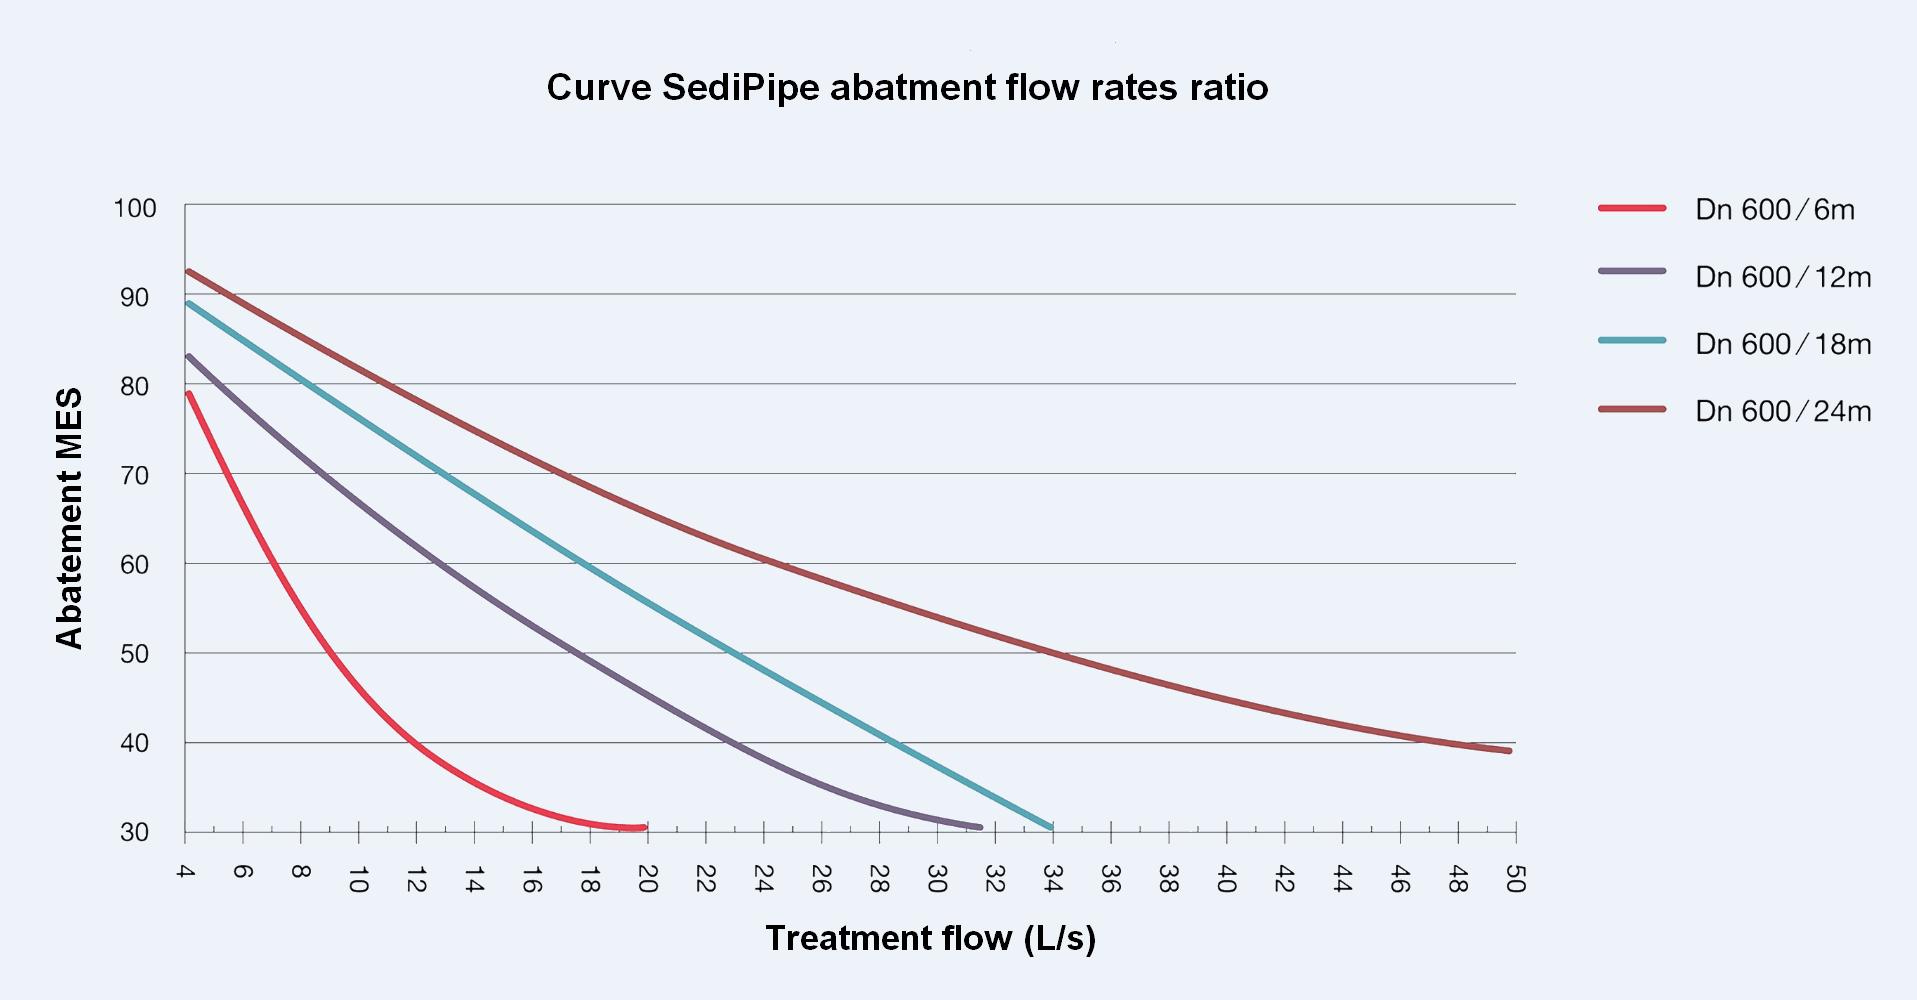 SediPipe abatment flow 63